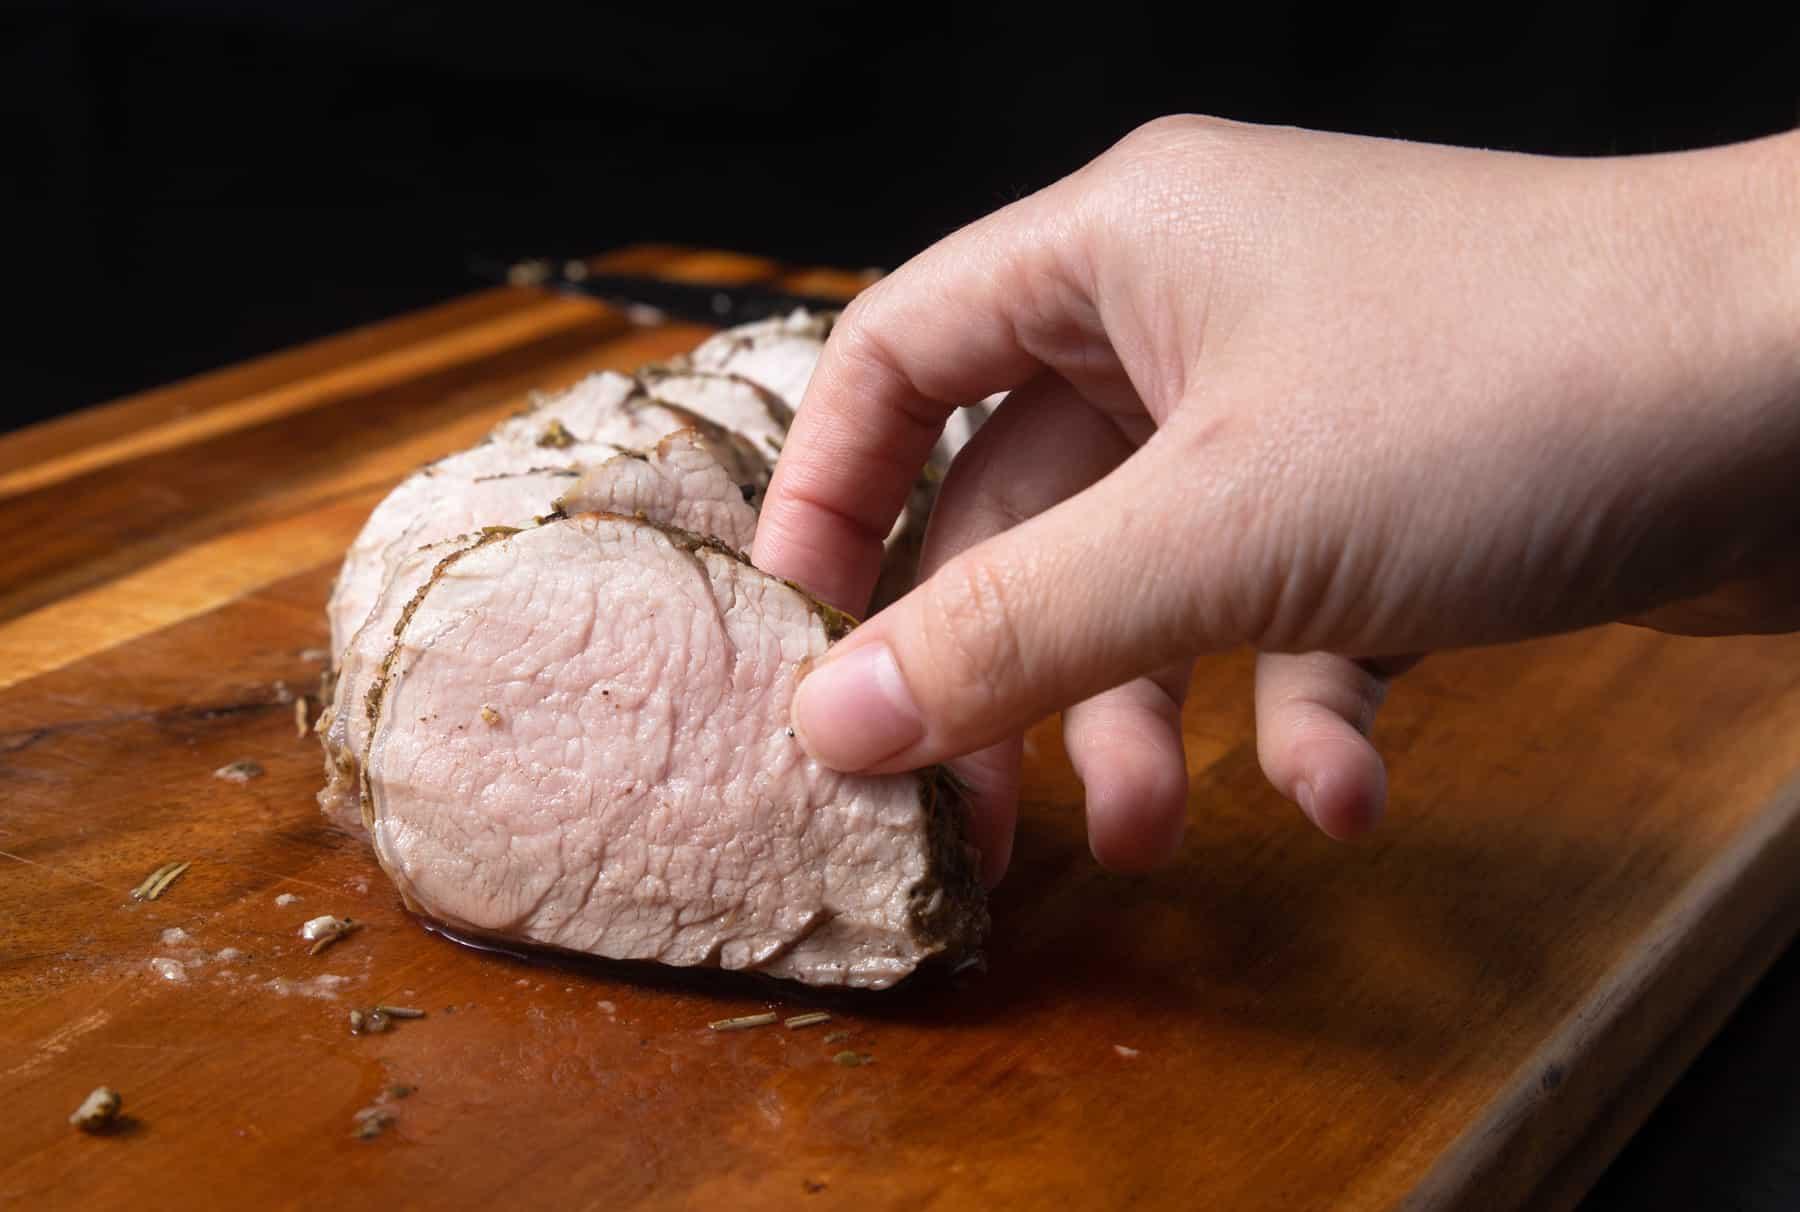 Instant Pot Pork Tenderloin | Pressure Cooker Pork Tenderloin | Instant Pot Pork | Pressure Cooker Pork | How to cook Pork Tenderloin | Pork Tenderloin Recipes